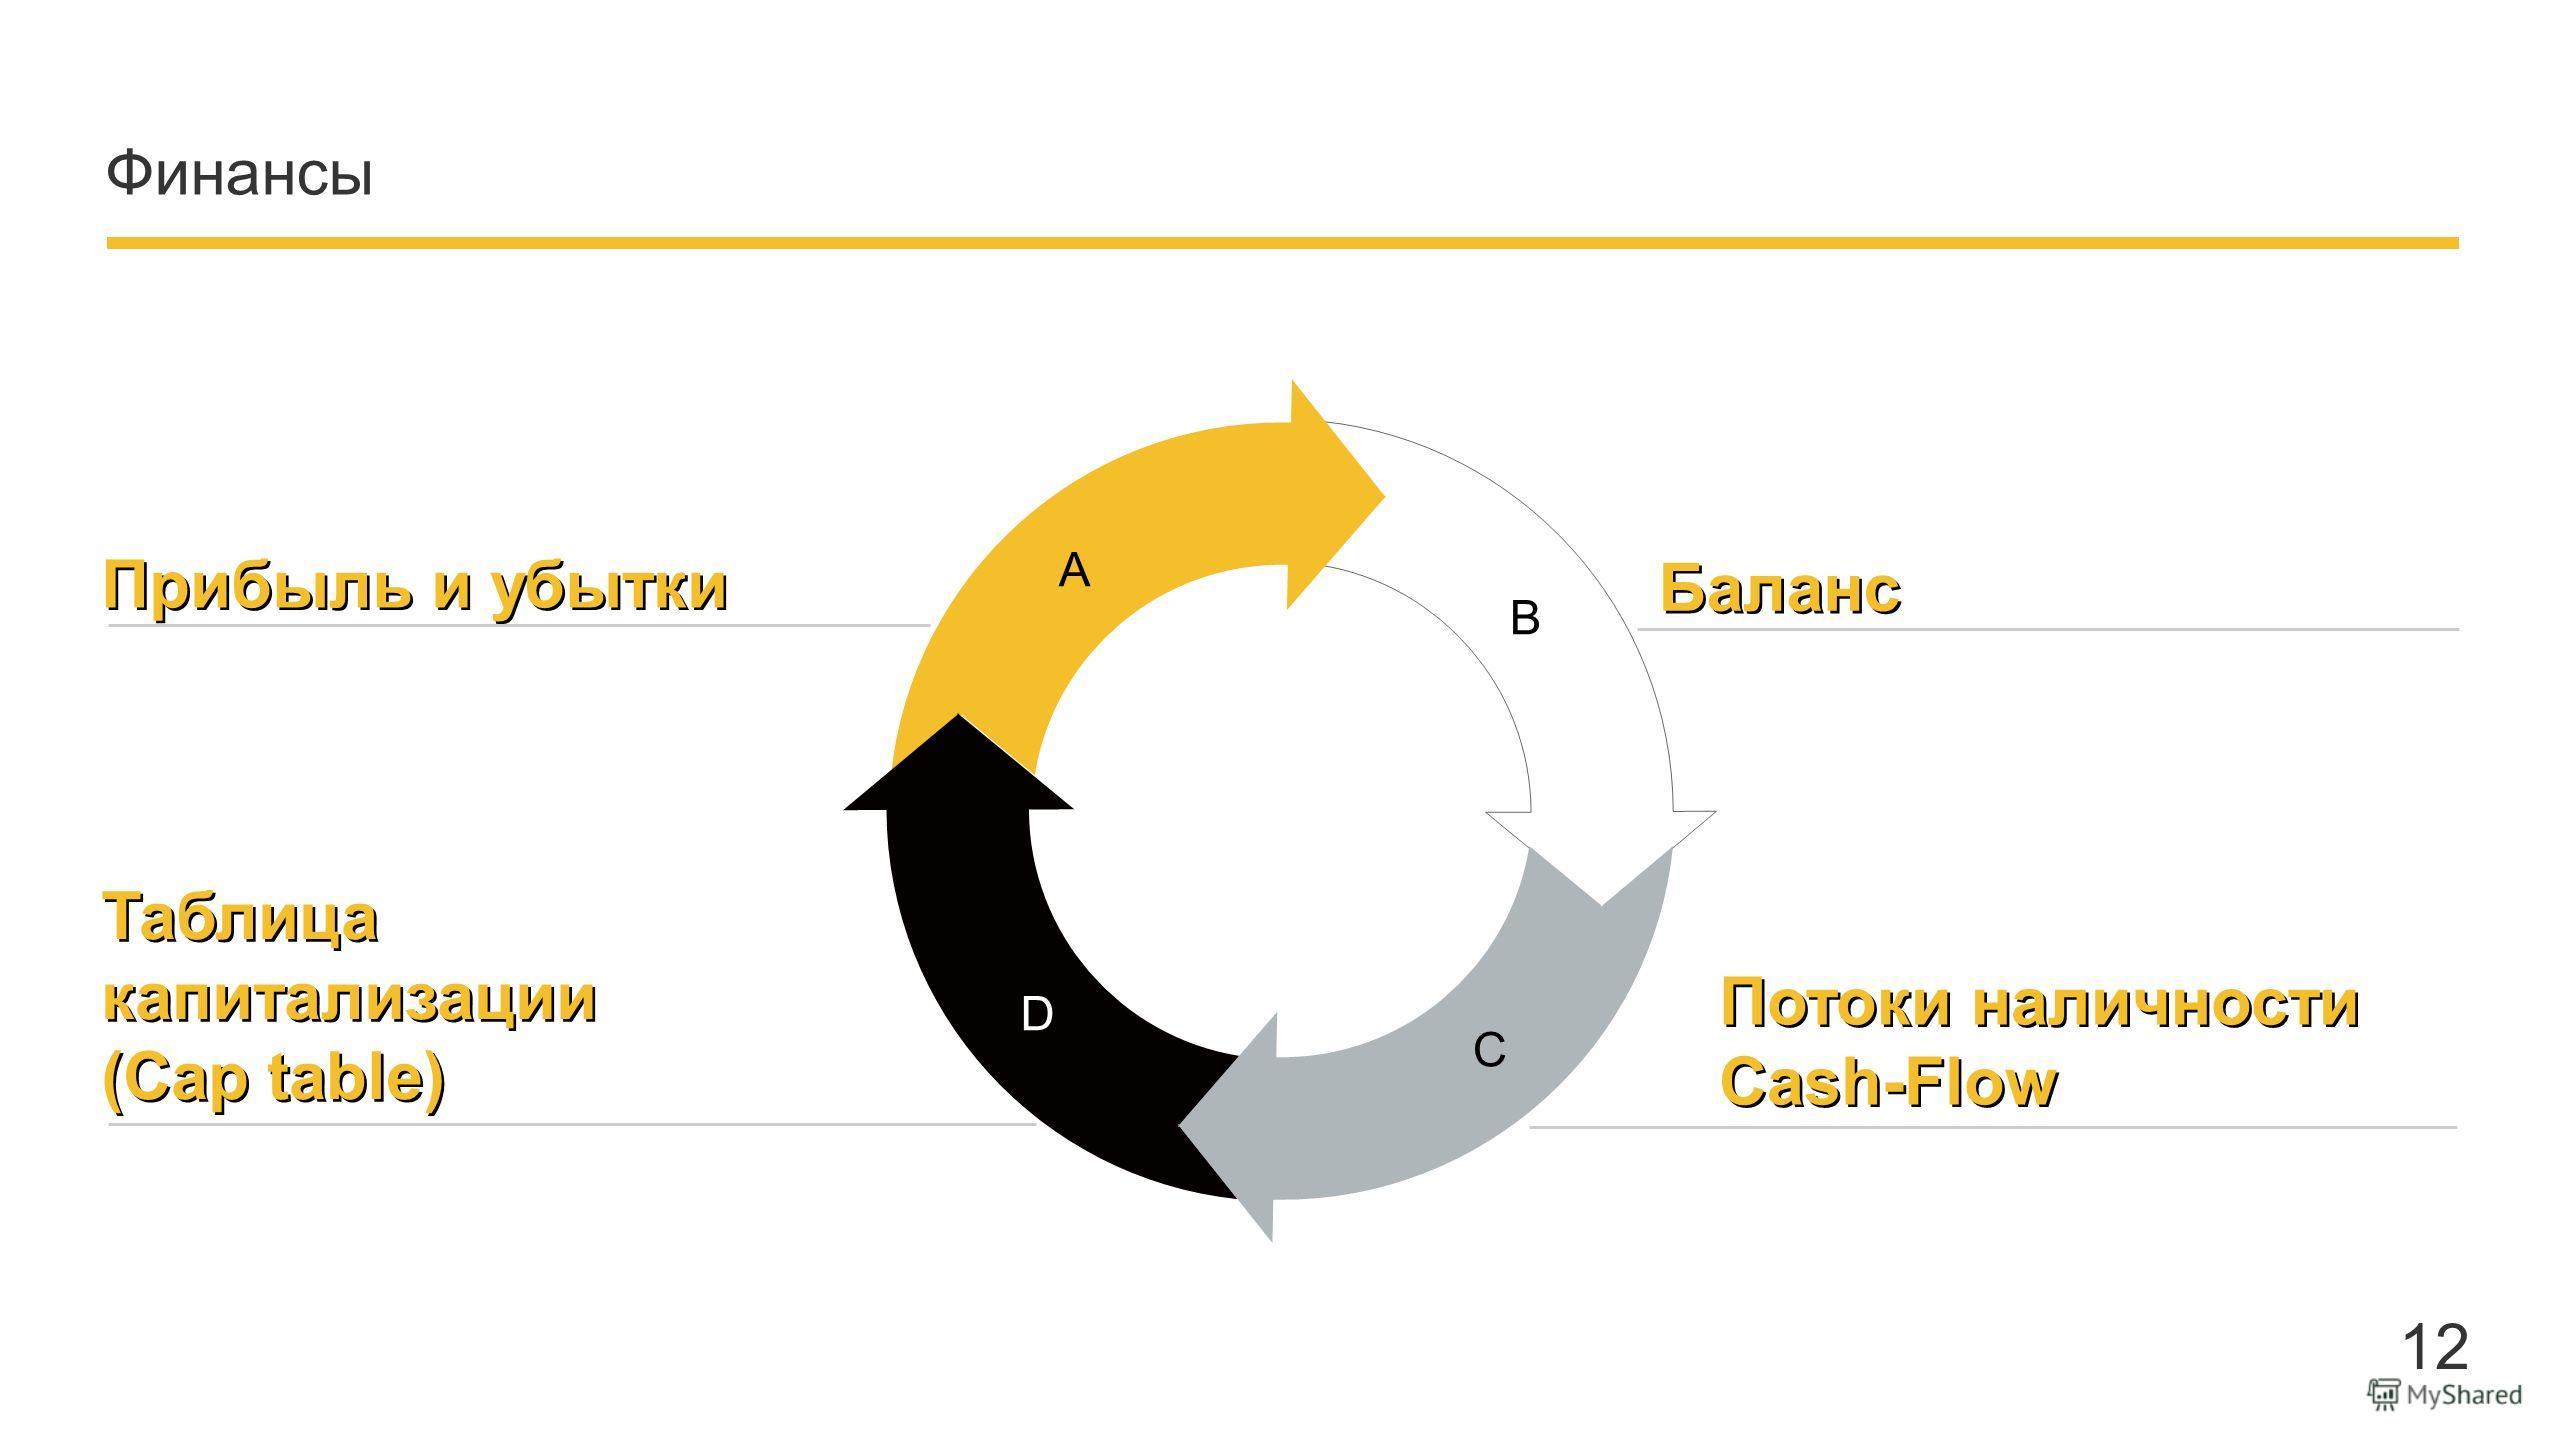 Company name - Presentation Финансы 1212 Прибыль и убытки A B C D Баланс Потоки наличности Cash-Flow Потоки наличности Cash-Flow Таблица капитализации (Cap table) Таблица капитализации (Cap table)